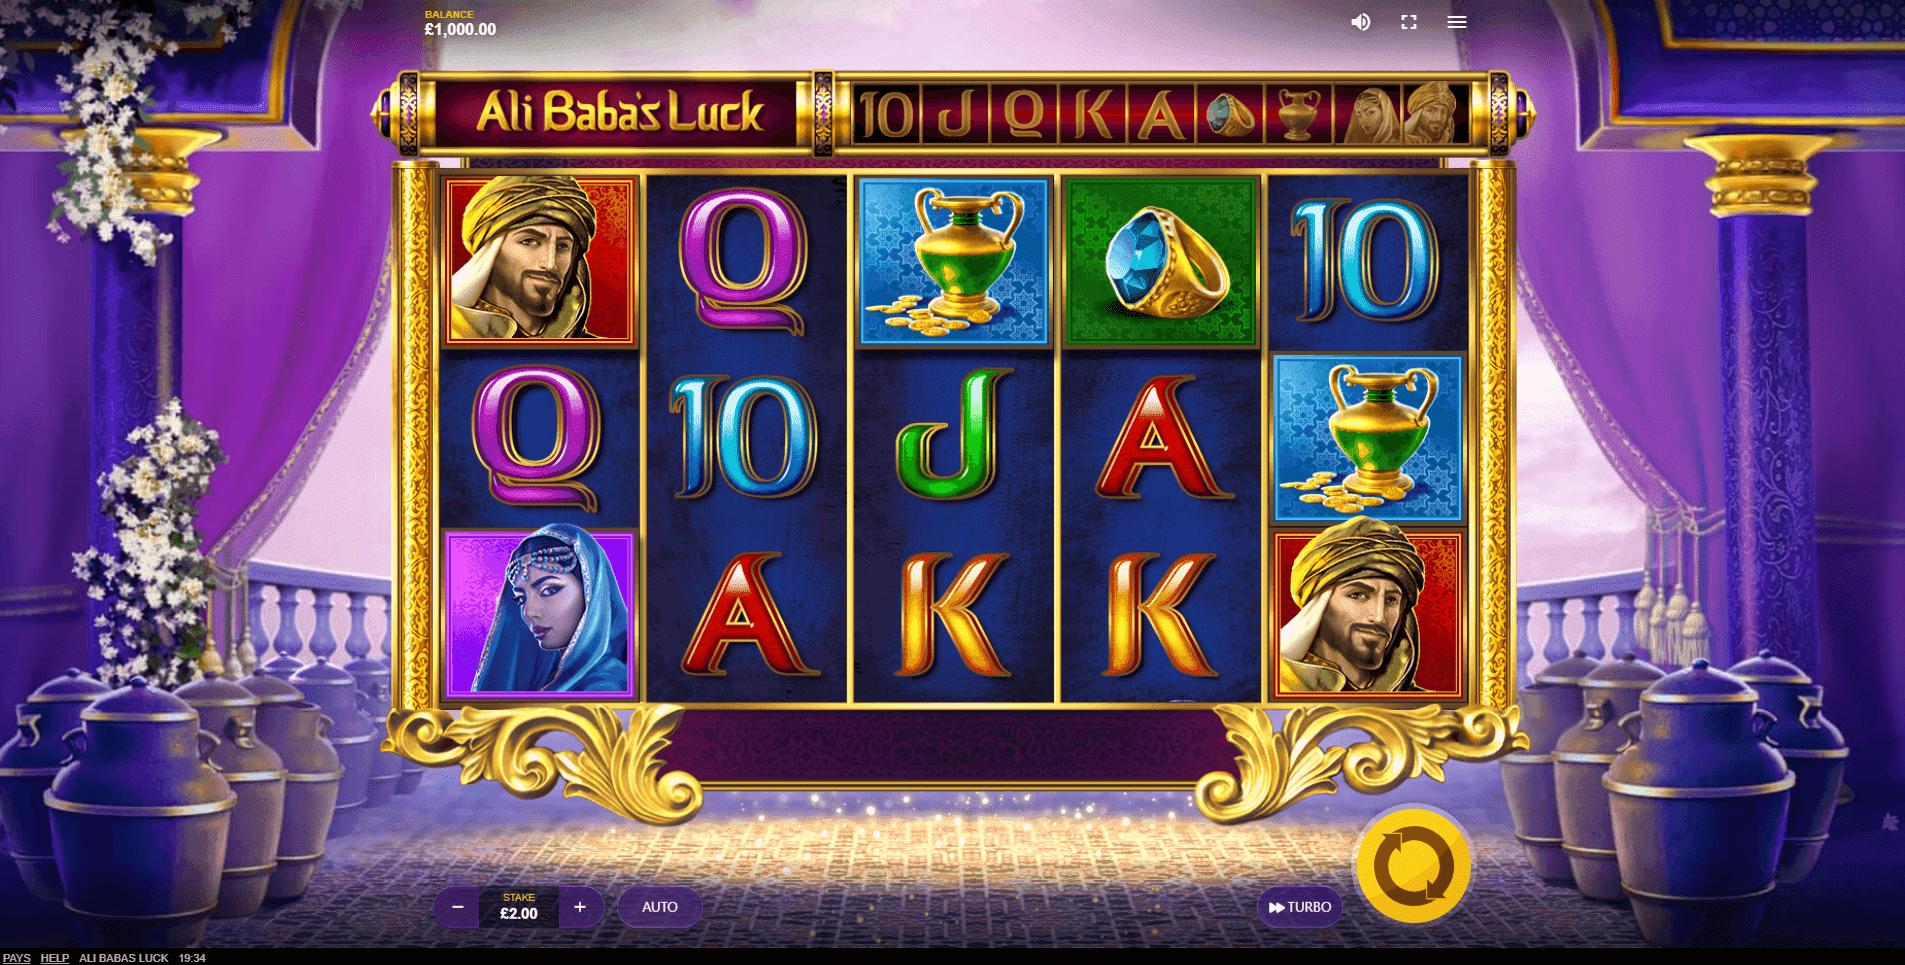 Ali Babas Luck slot machine screenshot